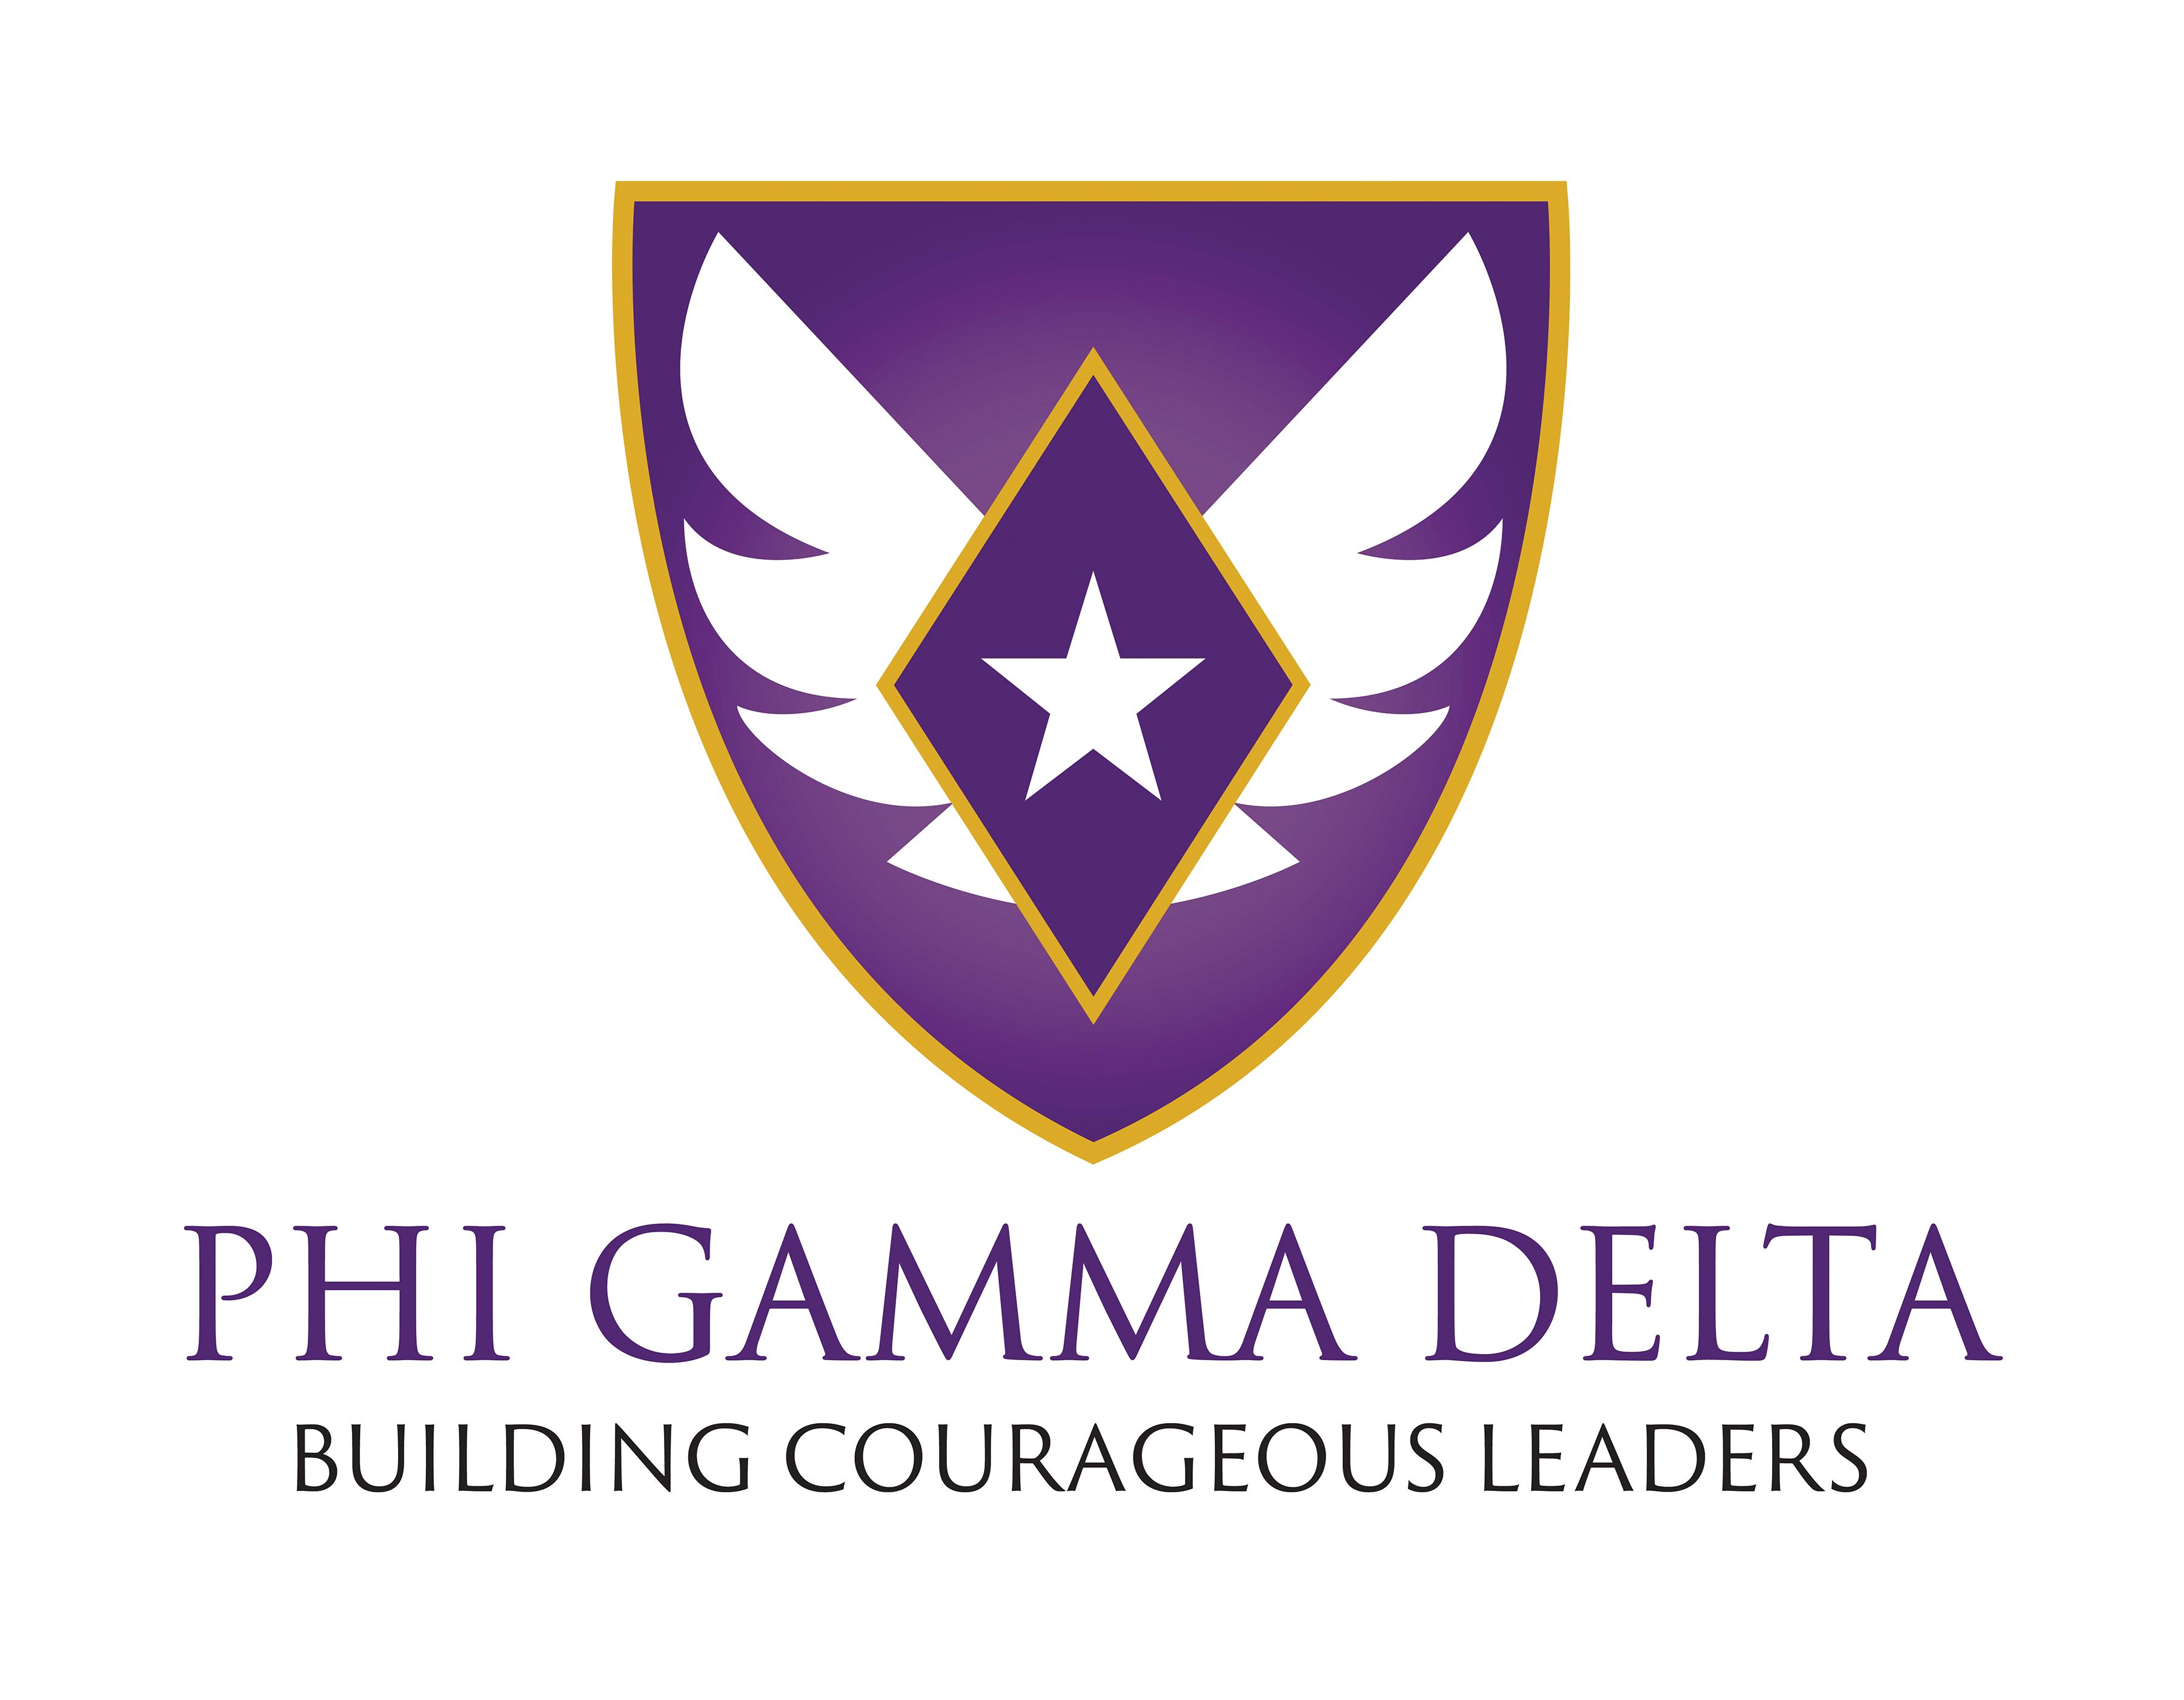 PhiGammaDeltaBuildingCourageousLeaders